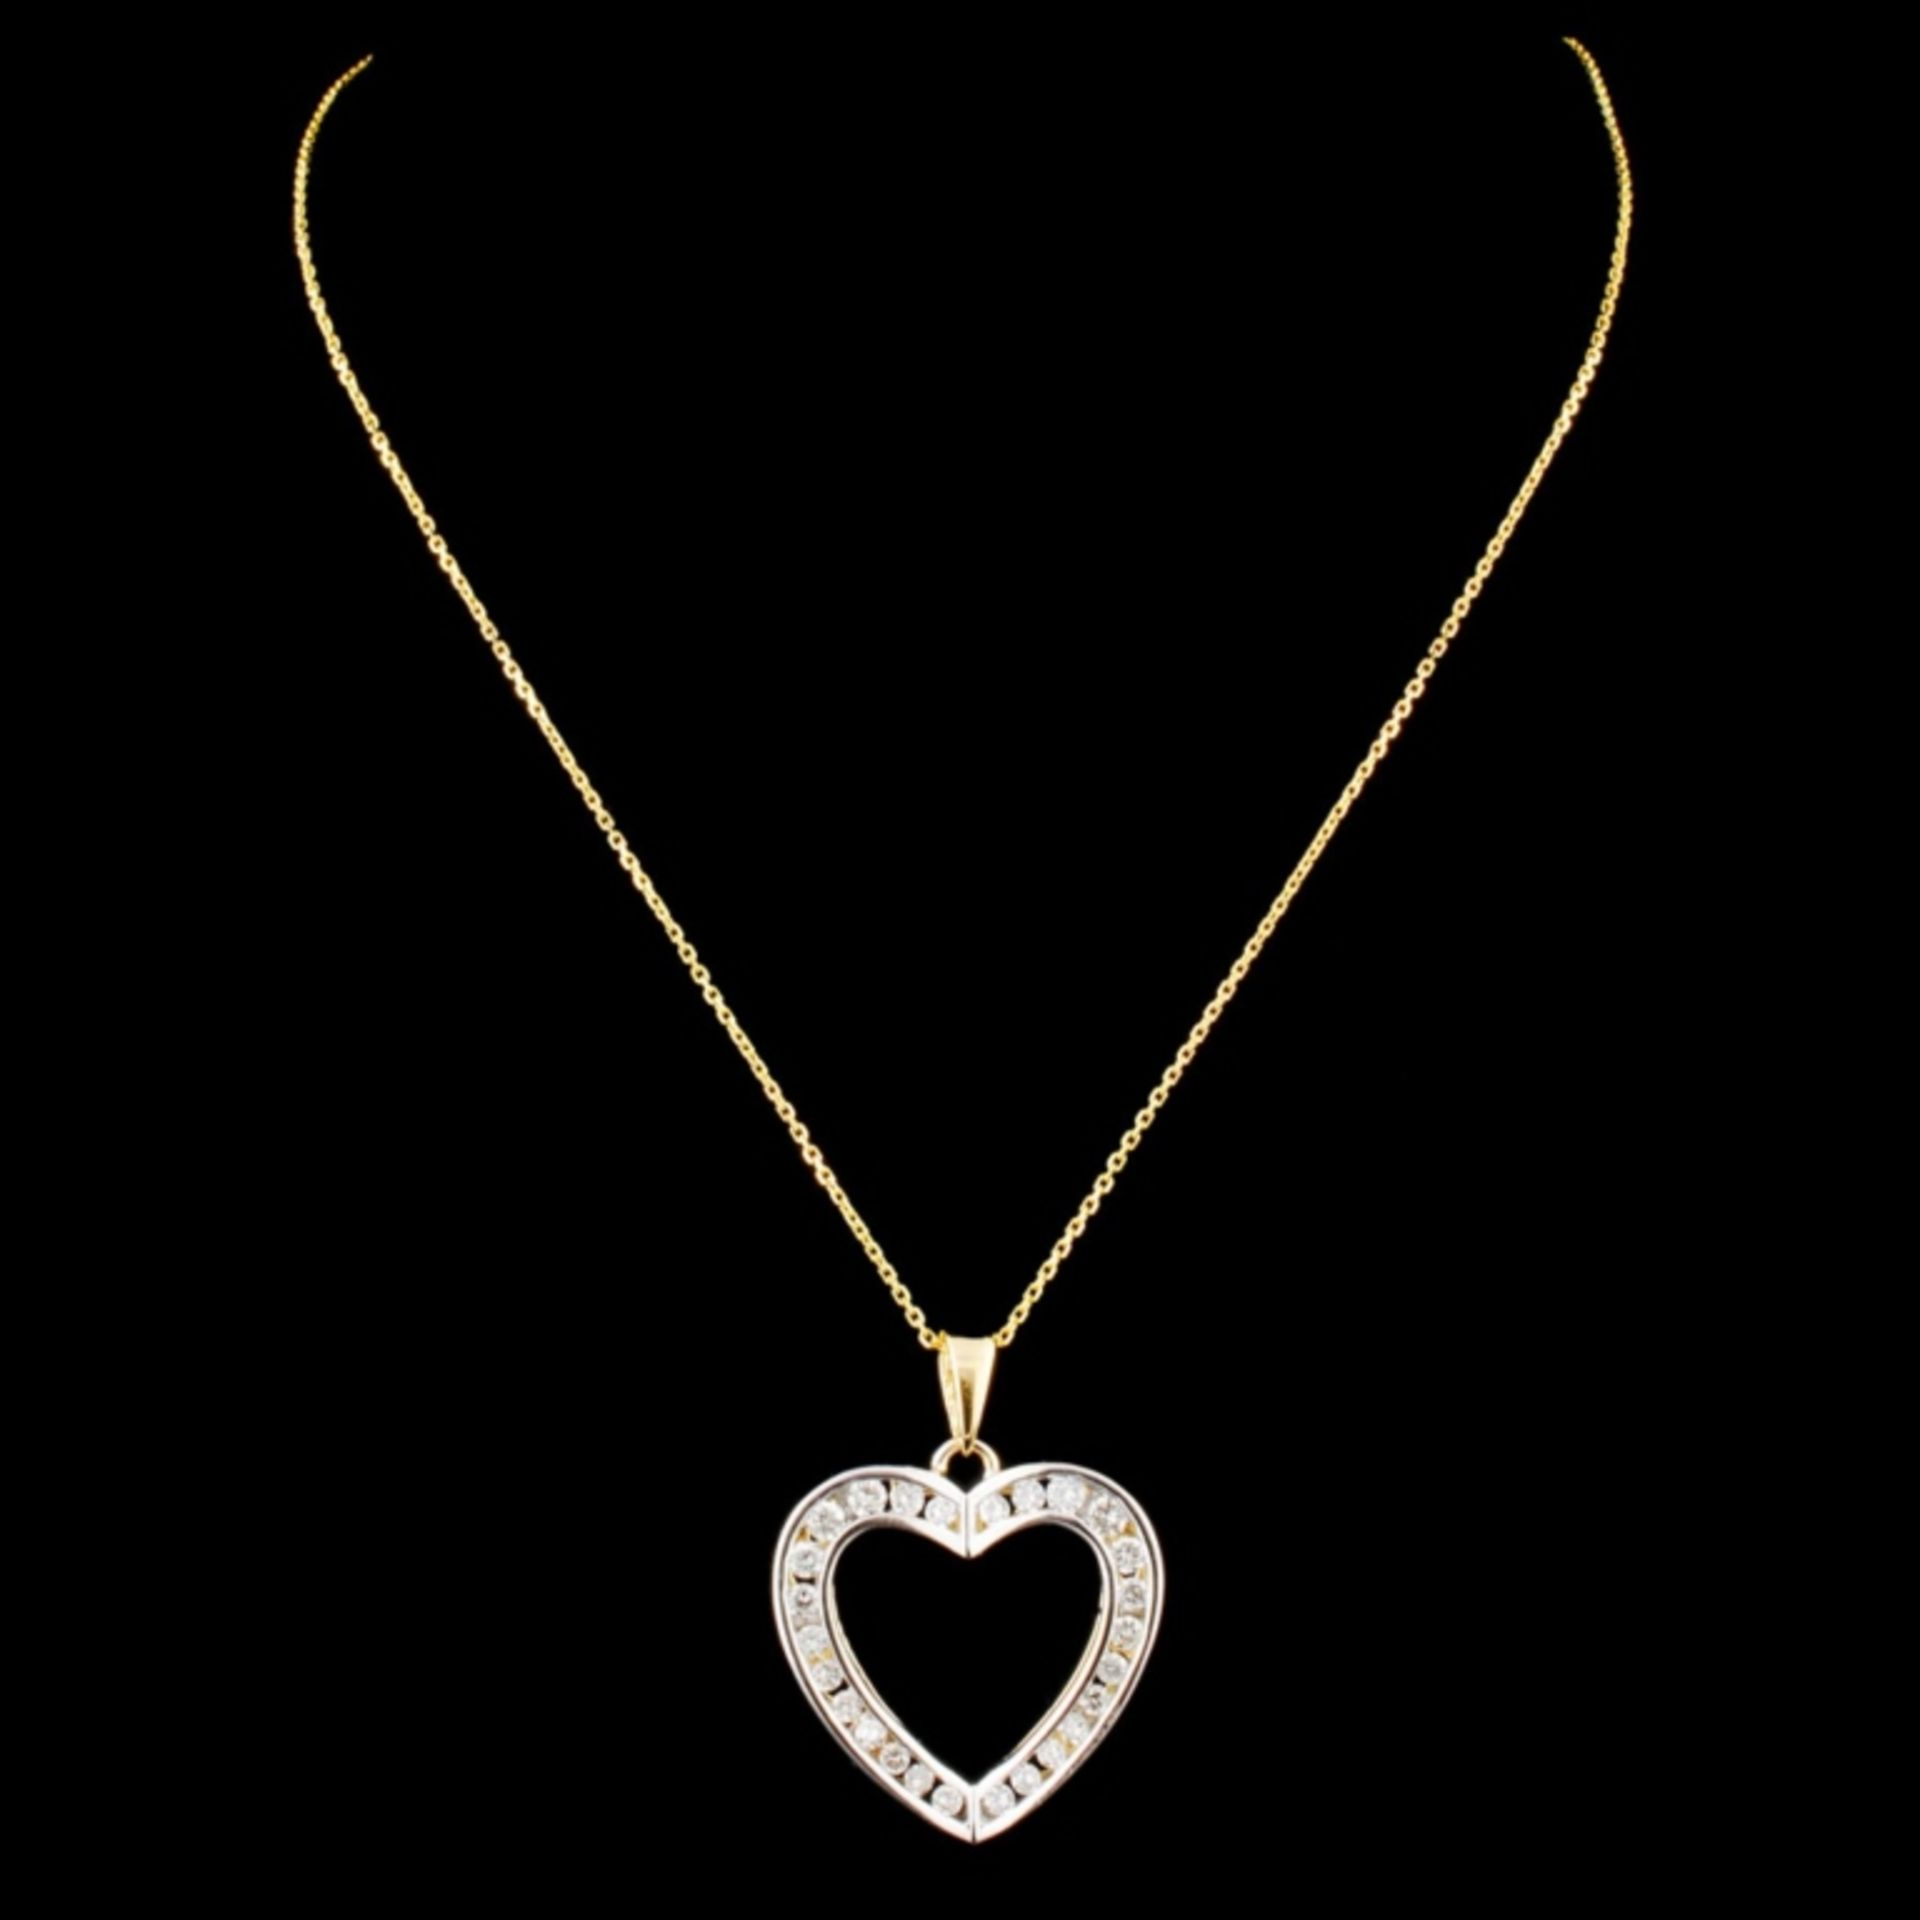 14K Gold 0.58ctw Diamond Pendant - Image 2 of 3